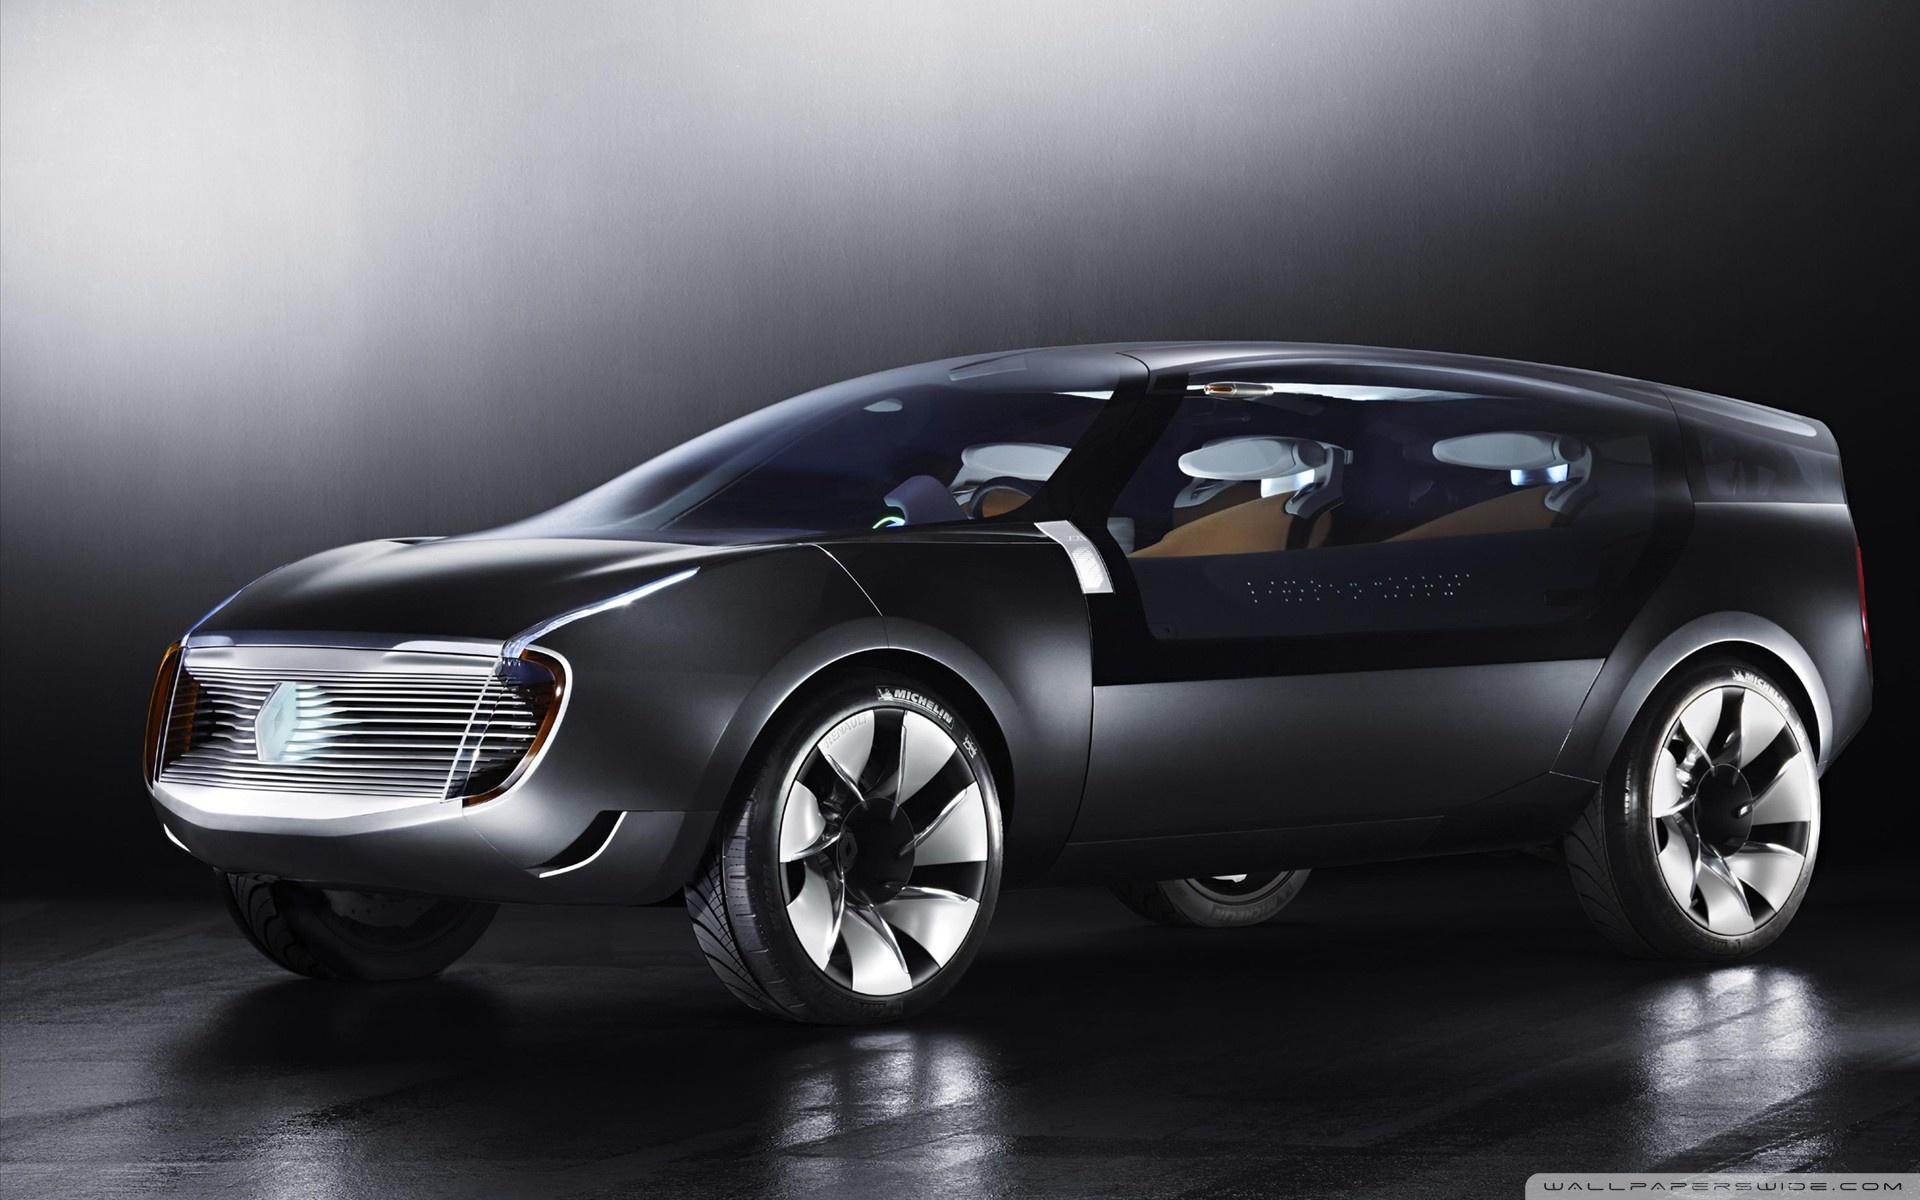 Raiders Wallpaper 3d Renault Concept Car 4k Hd Desktop Wallpaper For 4k Ultra